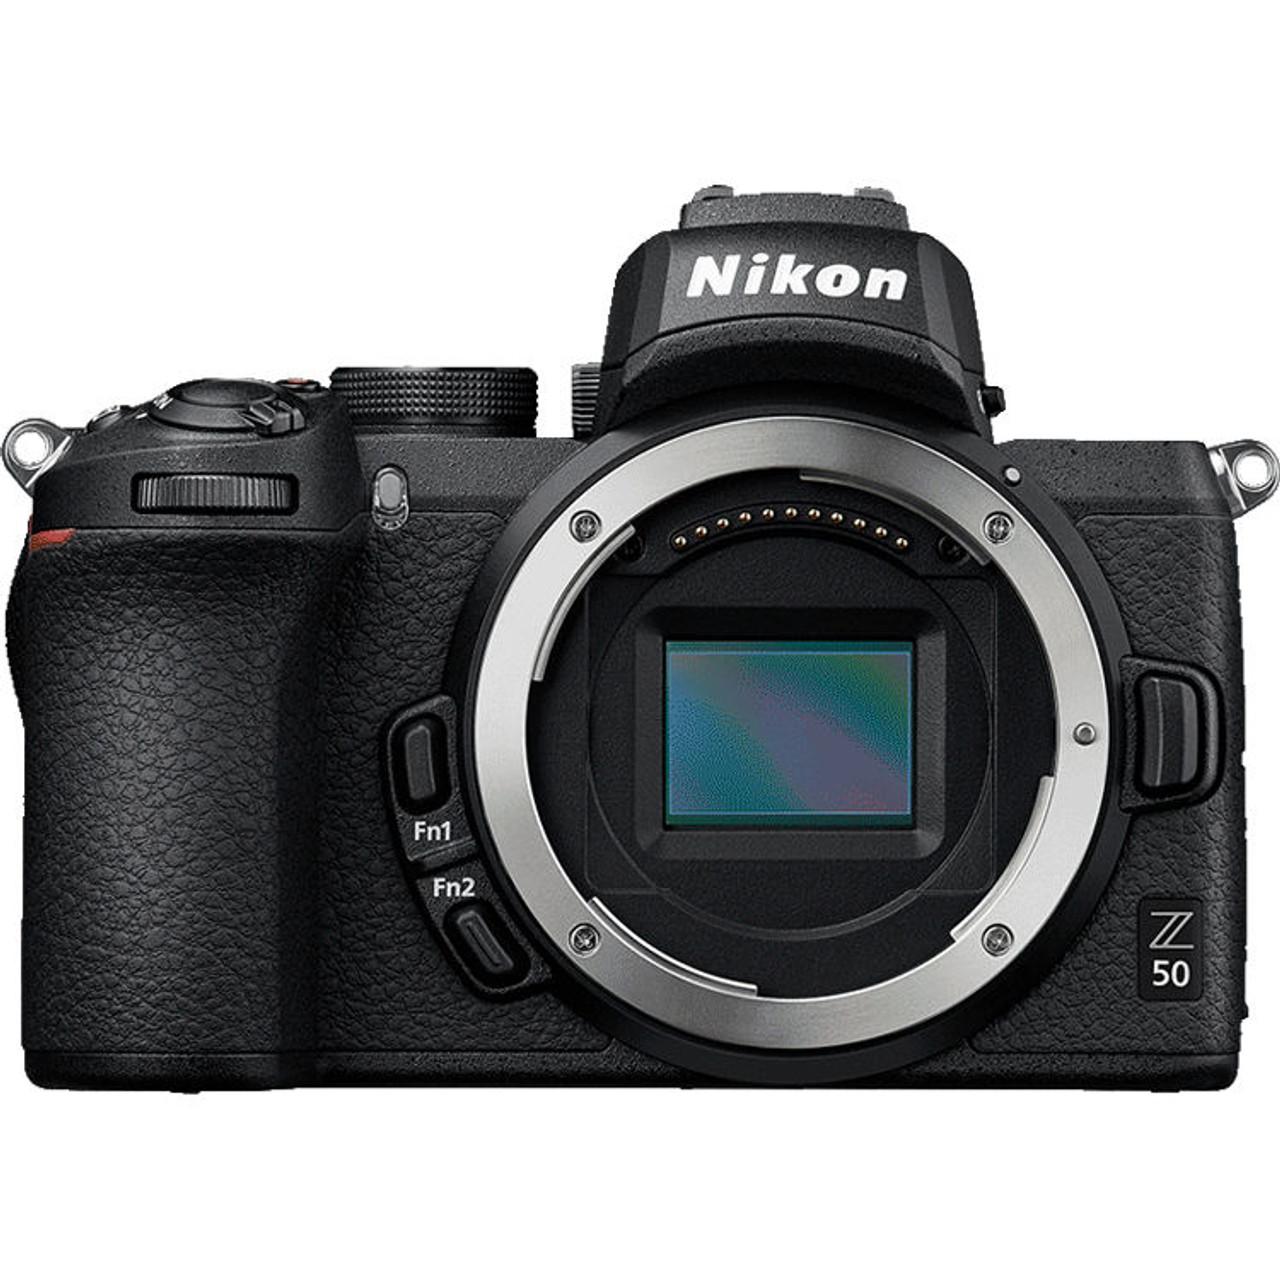 Nikon Z 50 Mirrorless Digital Camera Body